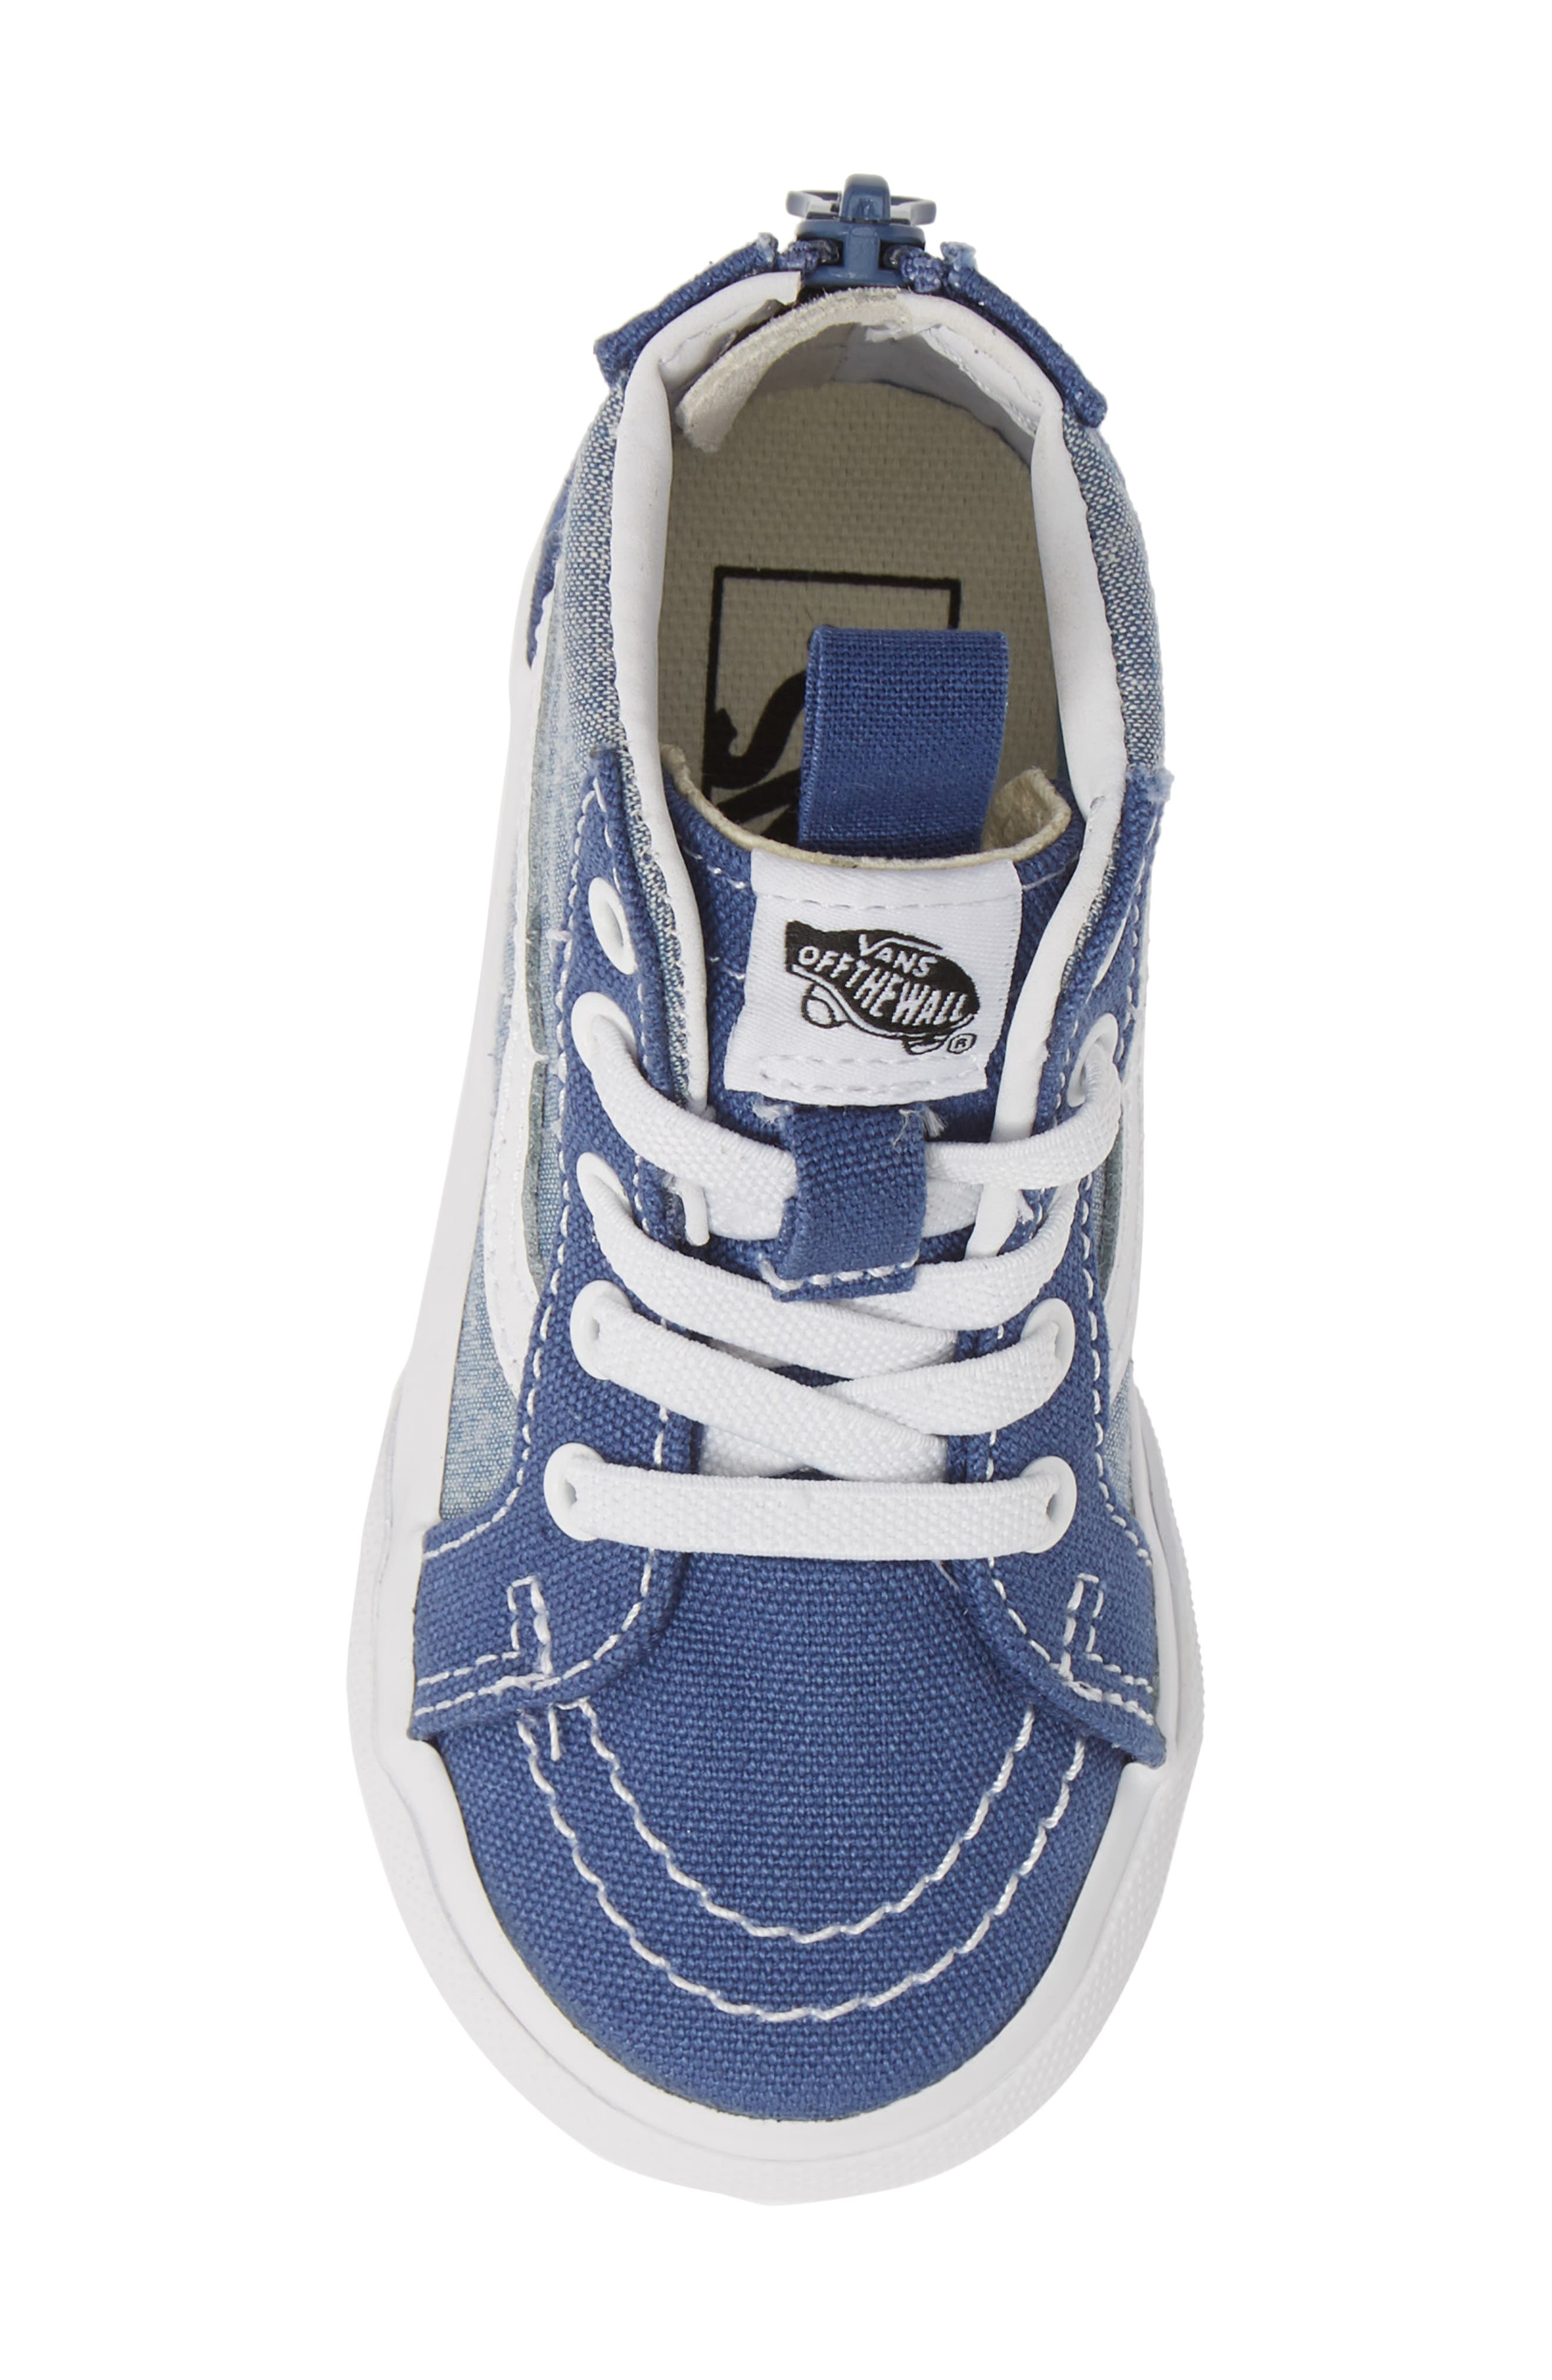 VANS, 'Sk8-Hi' Sneaker, Alternate thumbnail 5, color, CHAMBRAY CANVAS NAVY/ WHITE